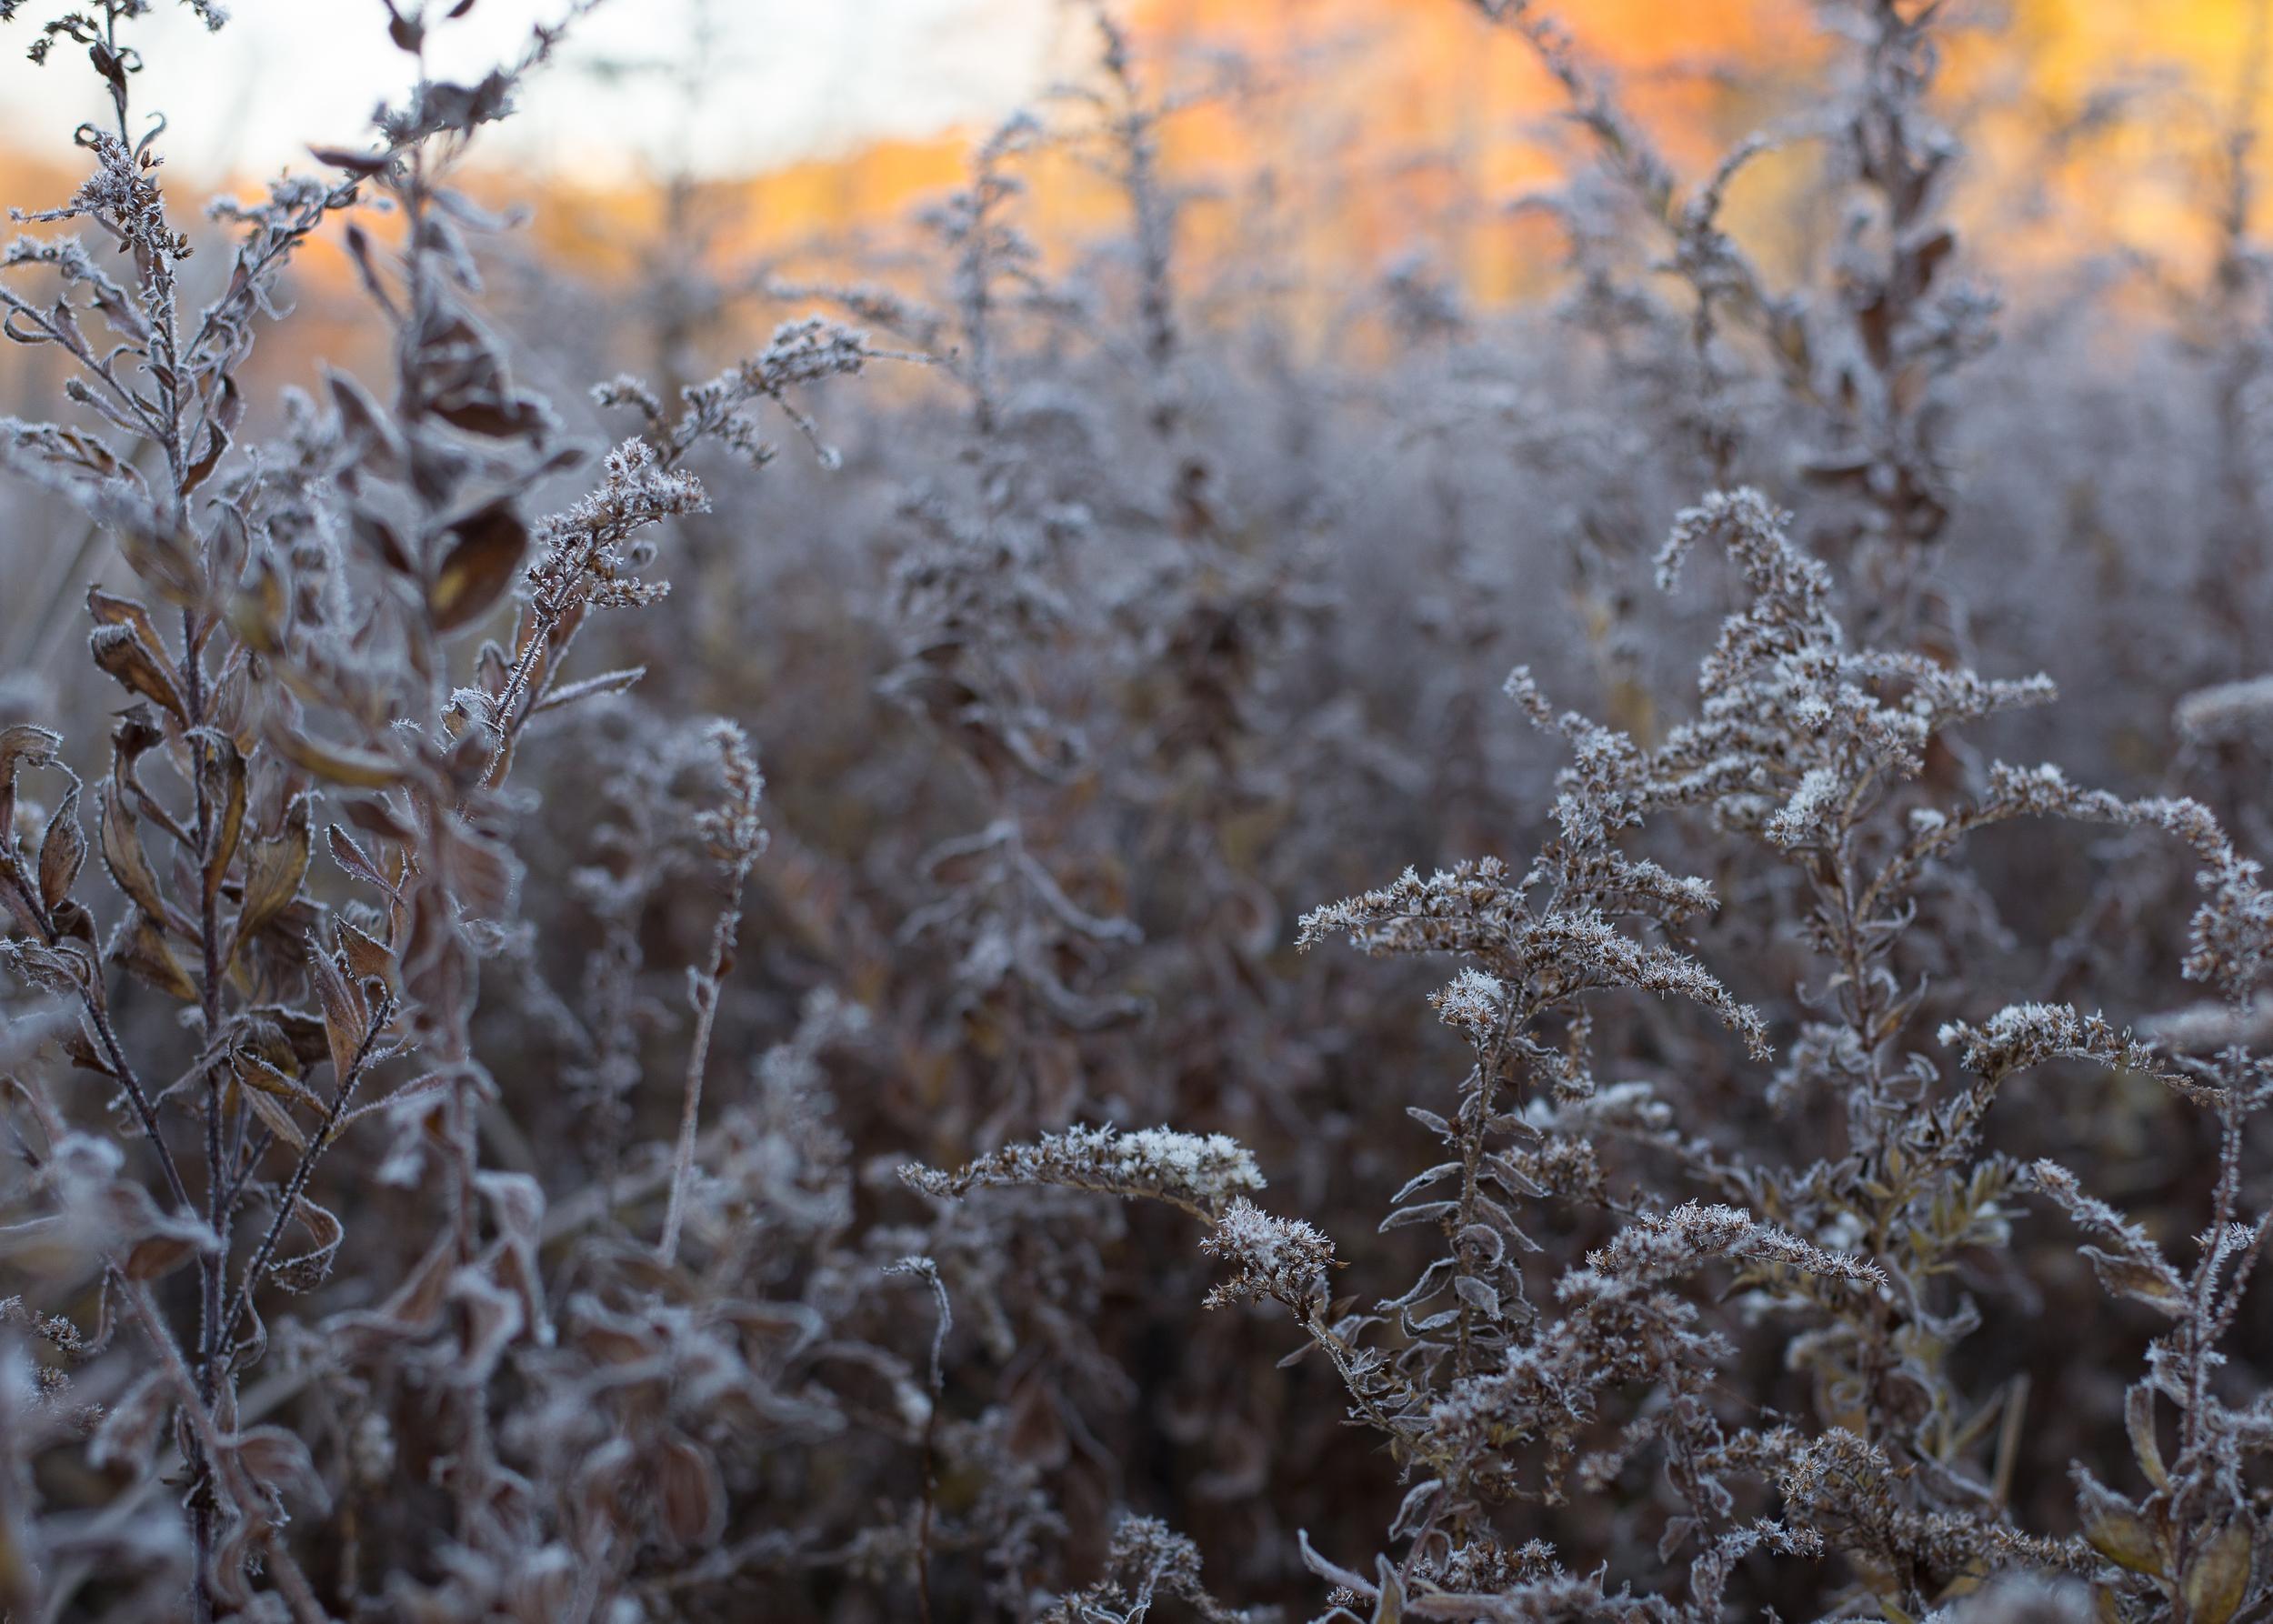 WinterHillStudio Frosty Brush at the Meadow.jpg